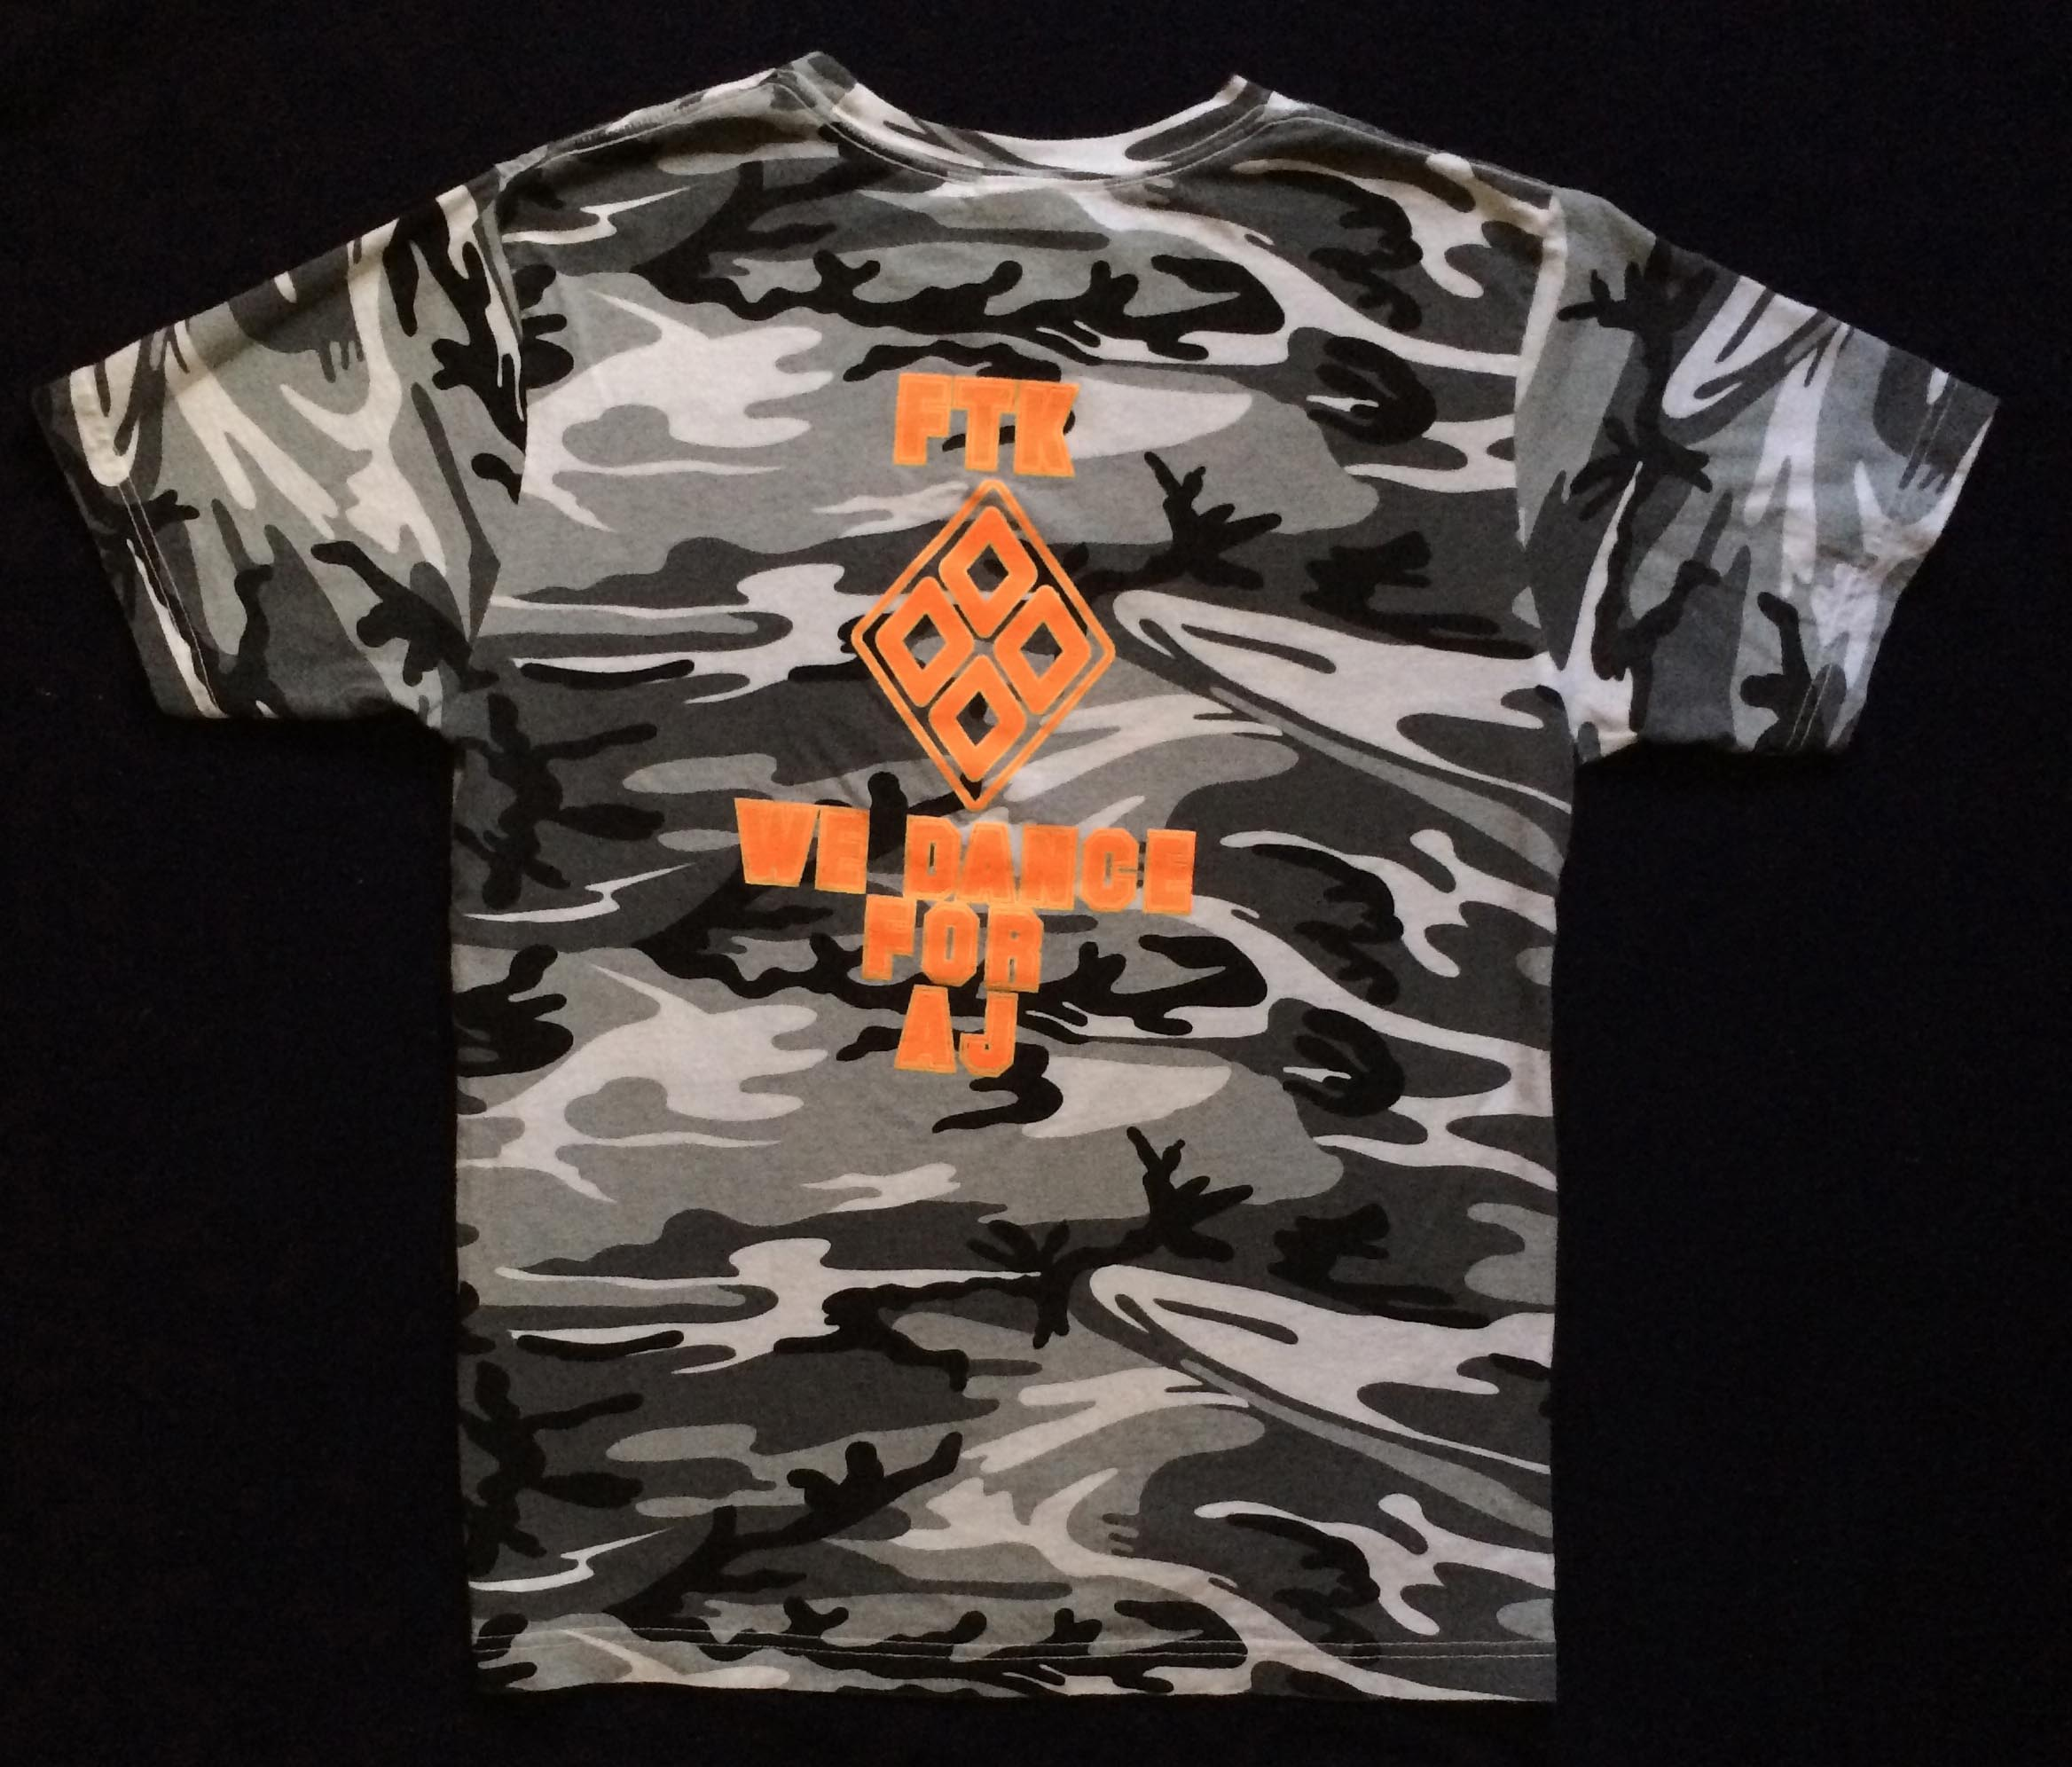 2013 THON T-Shirt (Back) - Feb. 15, 2013 -Camo THON shirts were designed by Omega's THON child